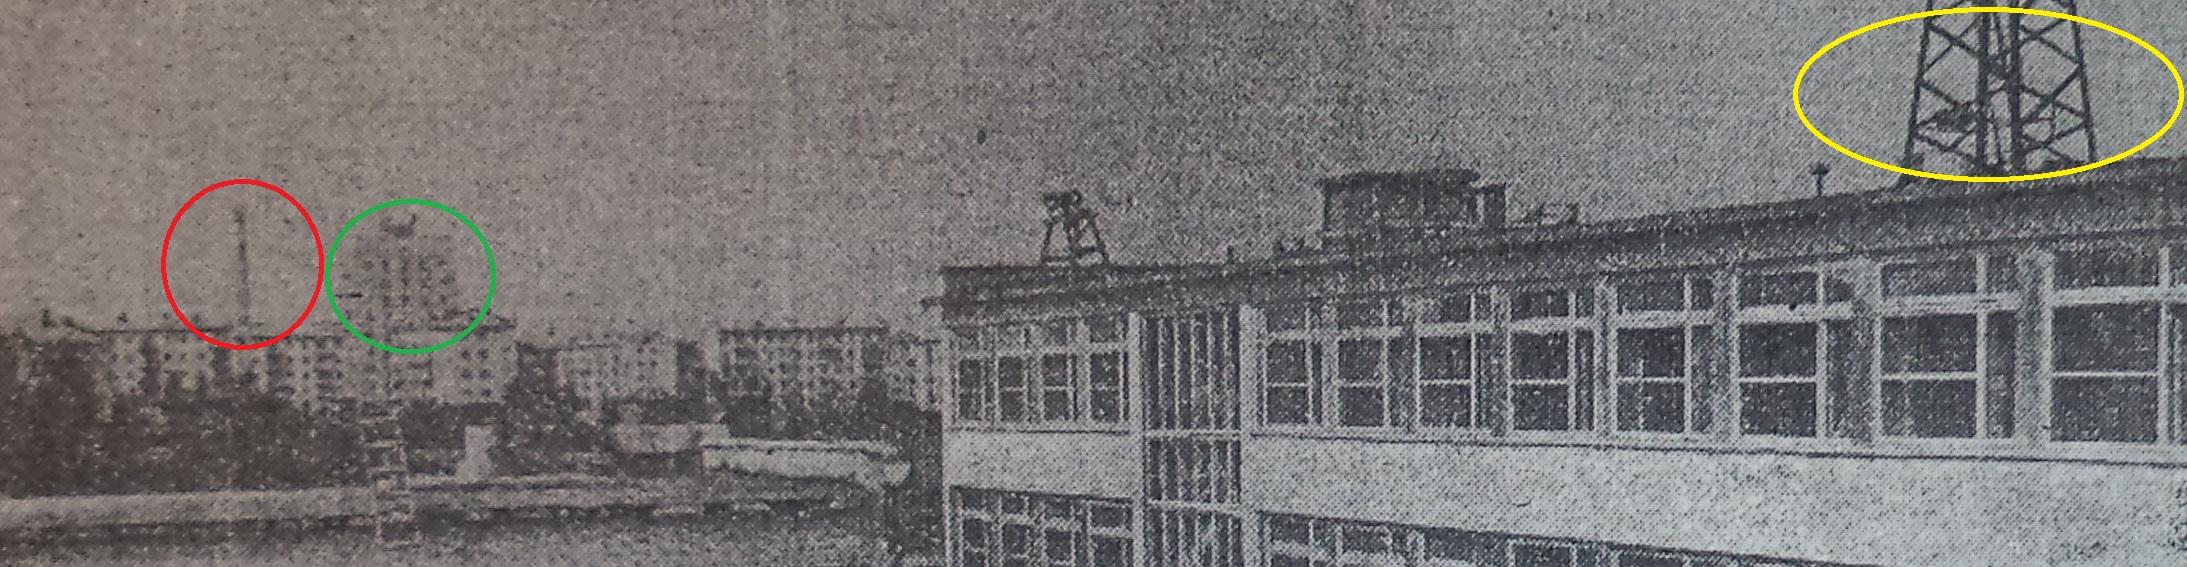 Карбышева-ФОТО-18-ВКц-1965-08-08-фото от школы № 28 в сторону ЦОК - копия